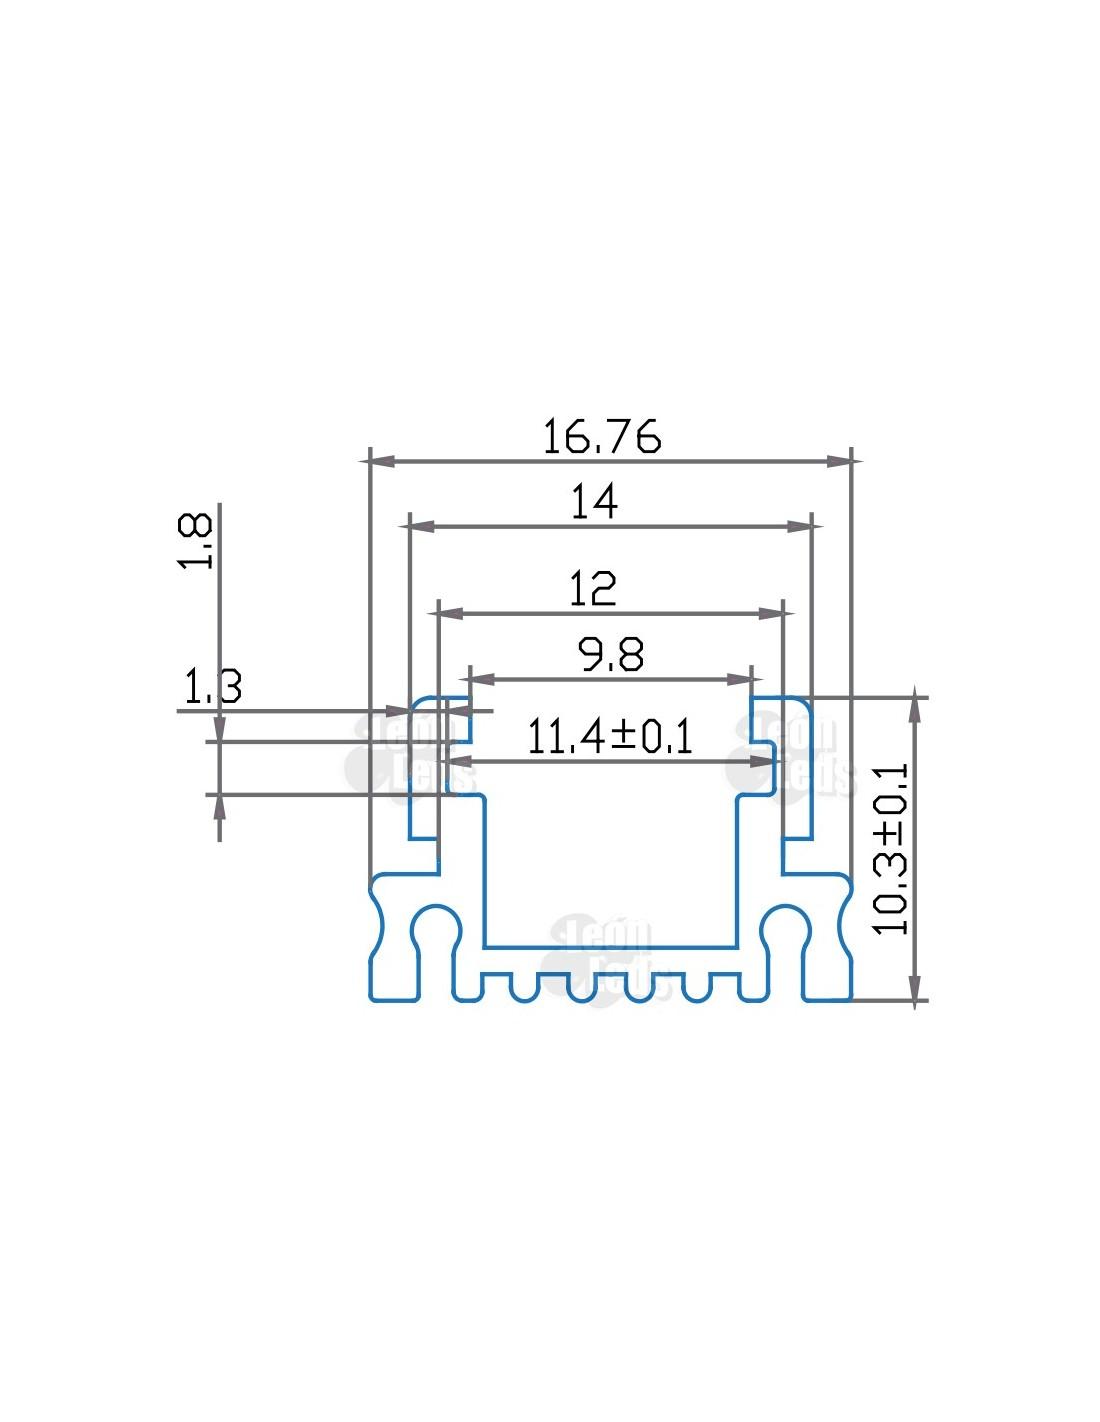 Perfil aluminio cuadrado para tira led - Perfil cuadrado aluminio ...